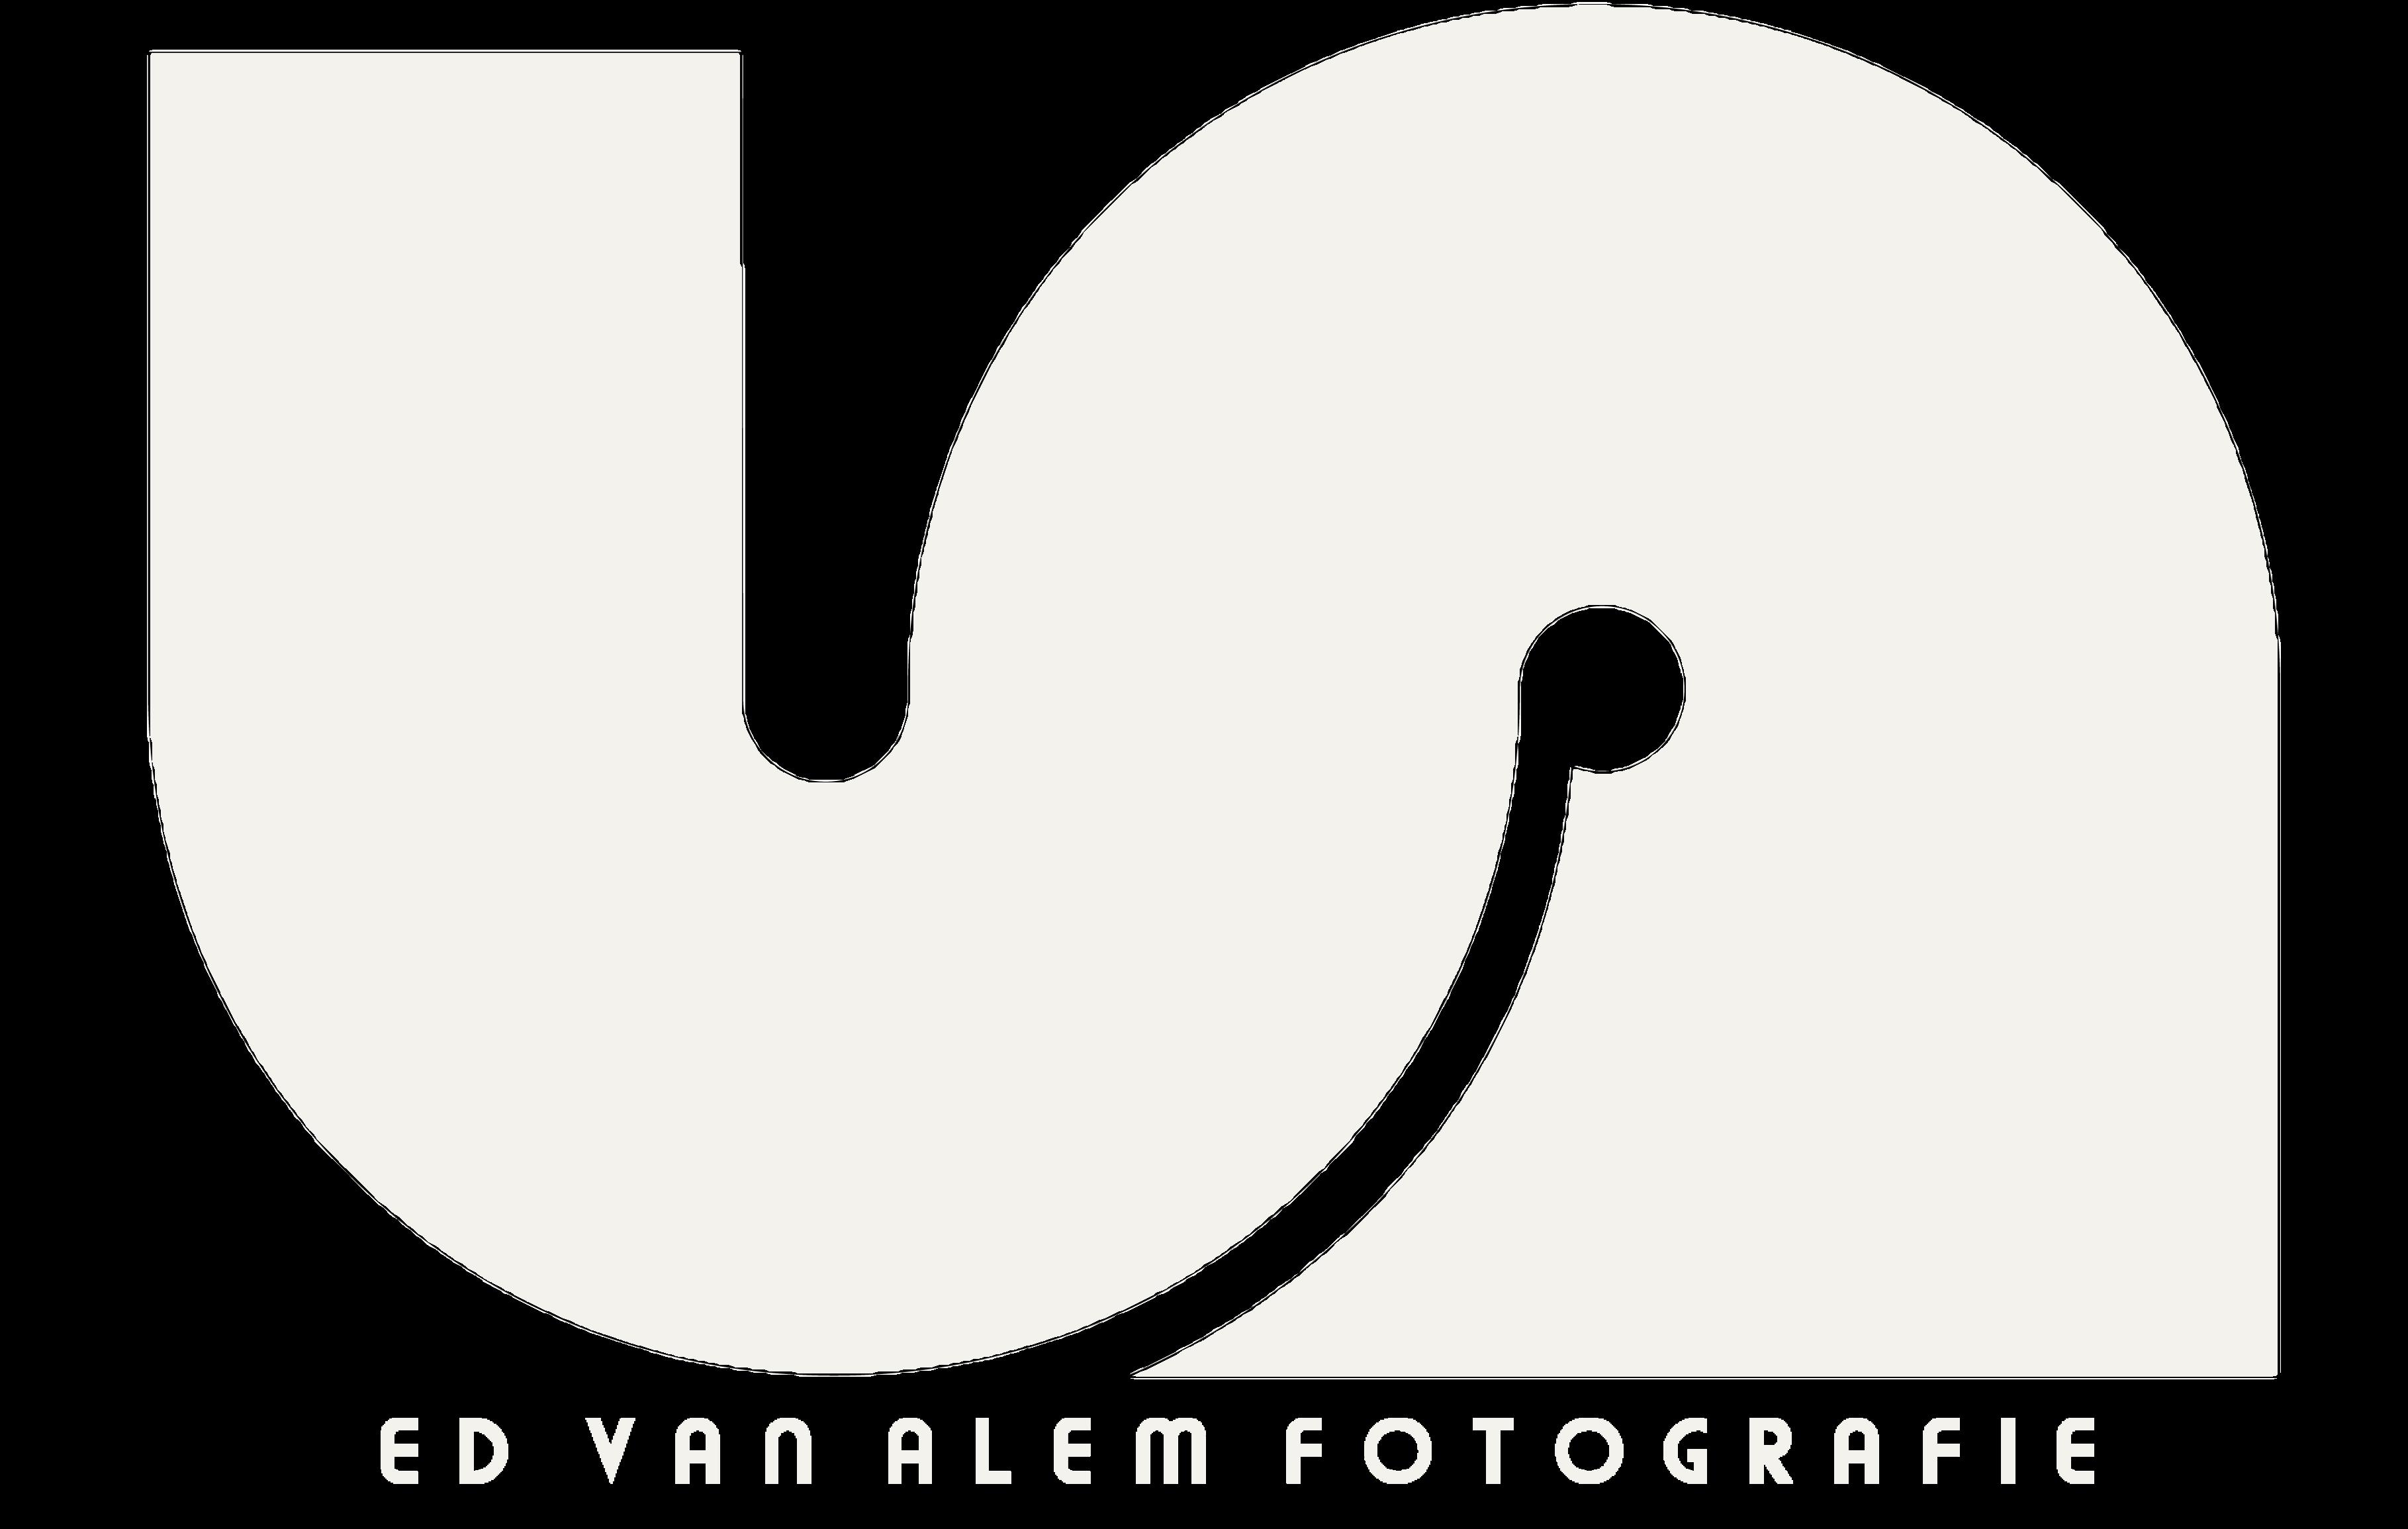 Van Alem Fotografie